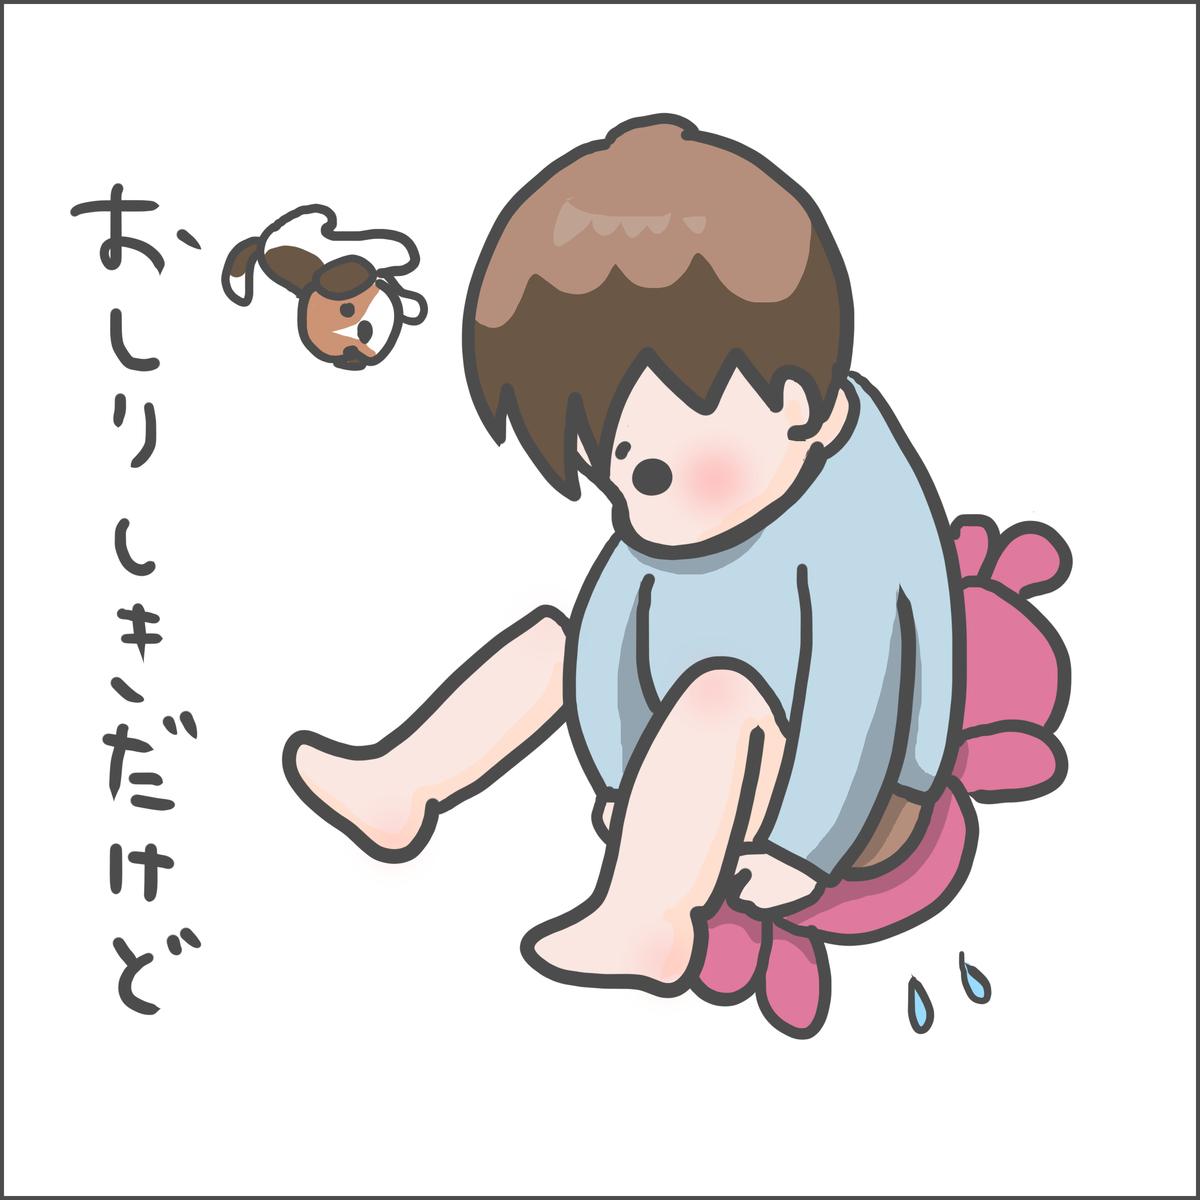 f:id:ika_yoshi:20201206005740j:plain